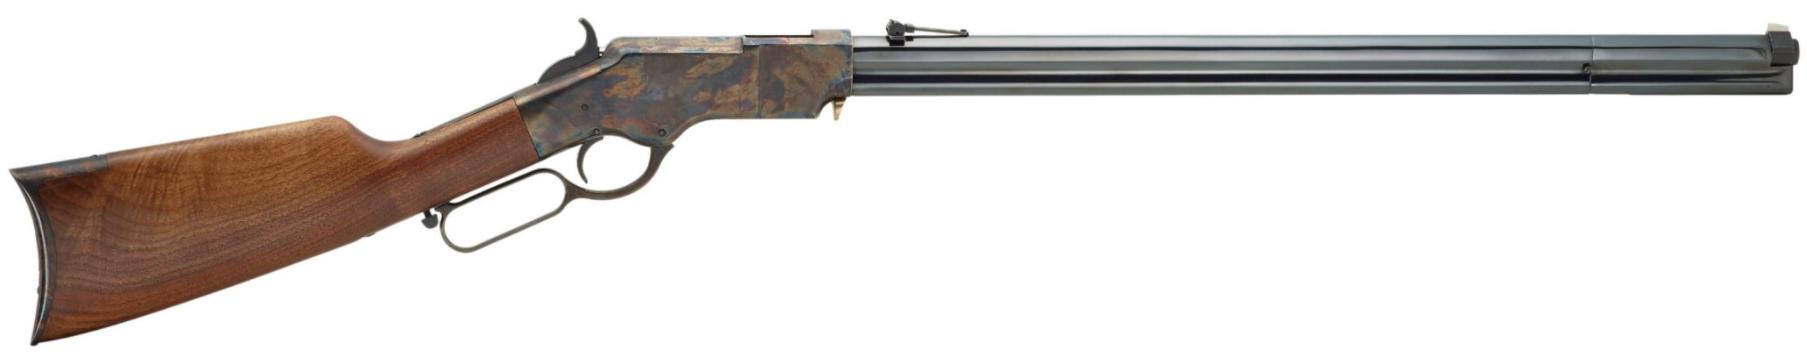 Henry New Original Henry Rifles